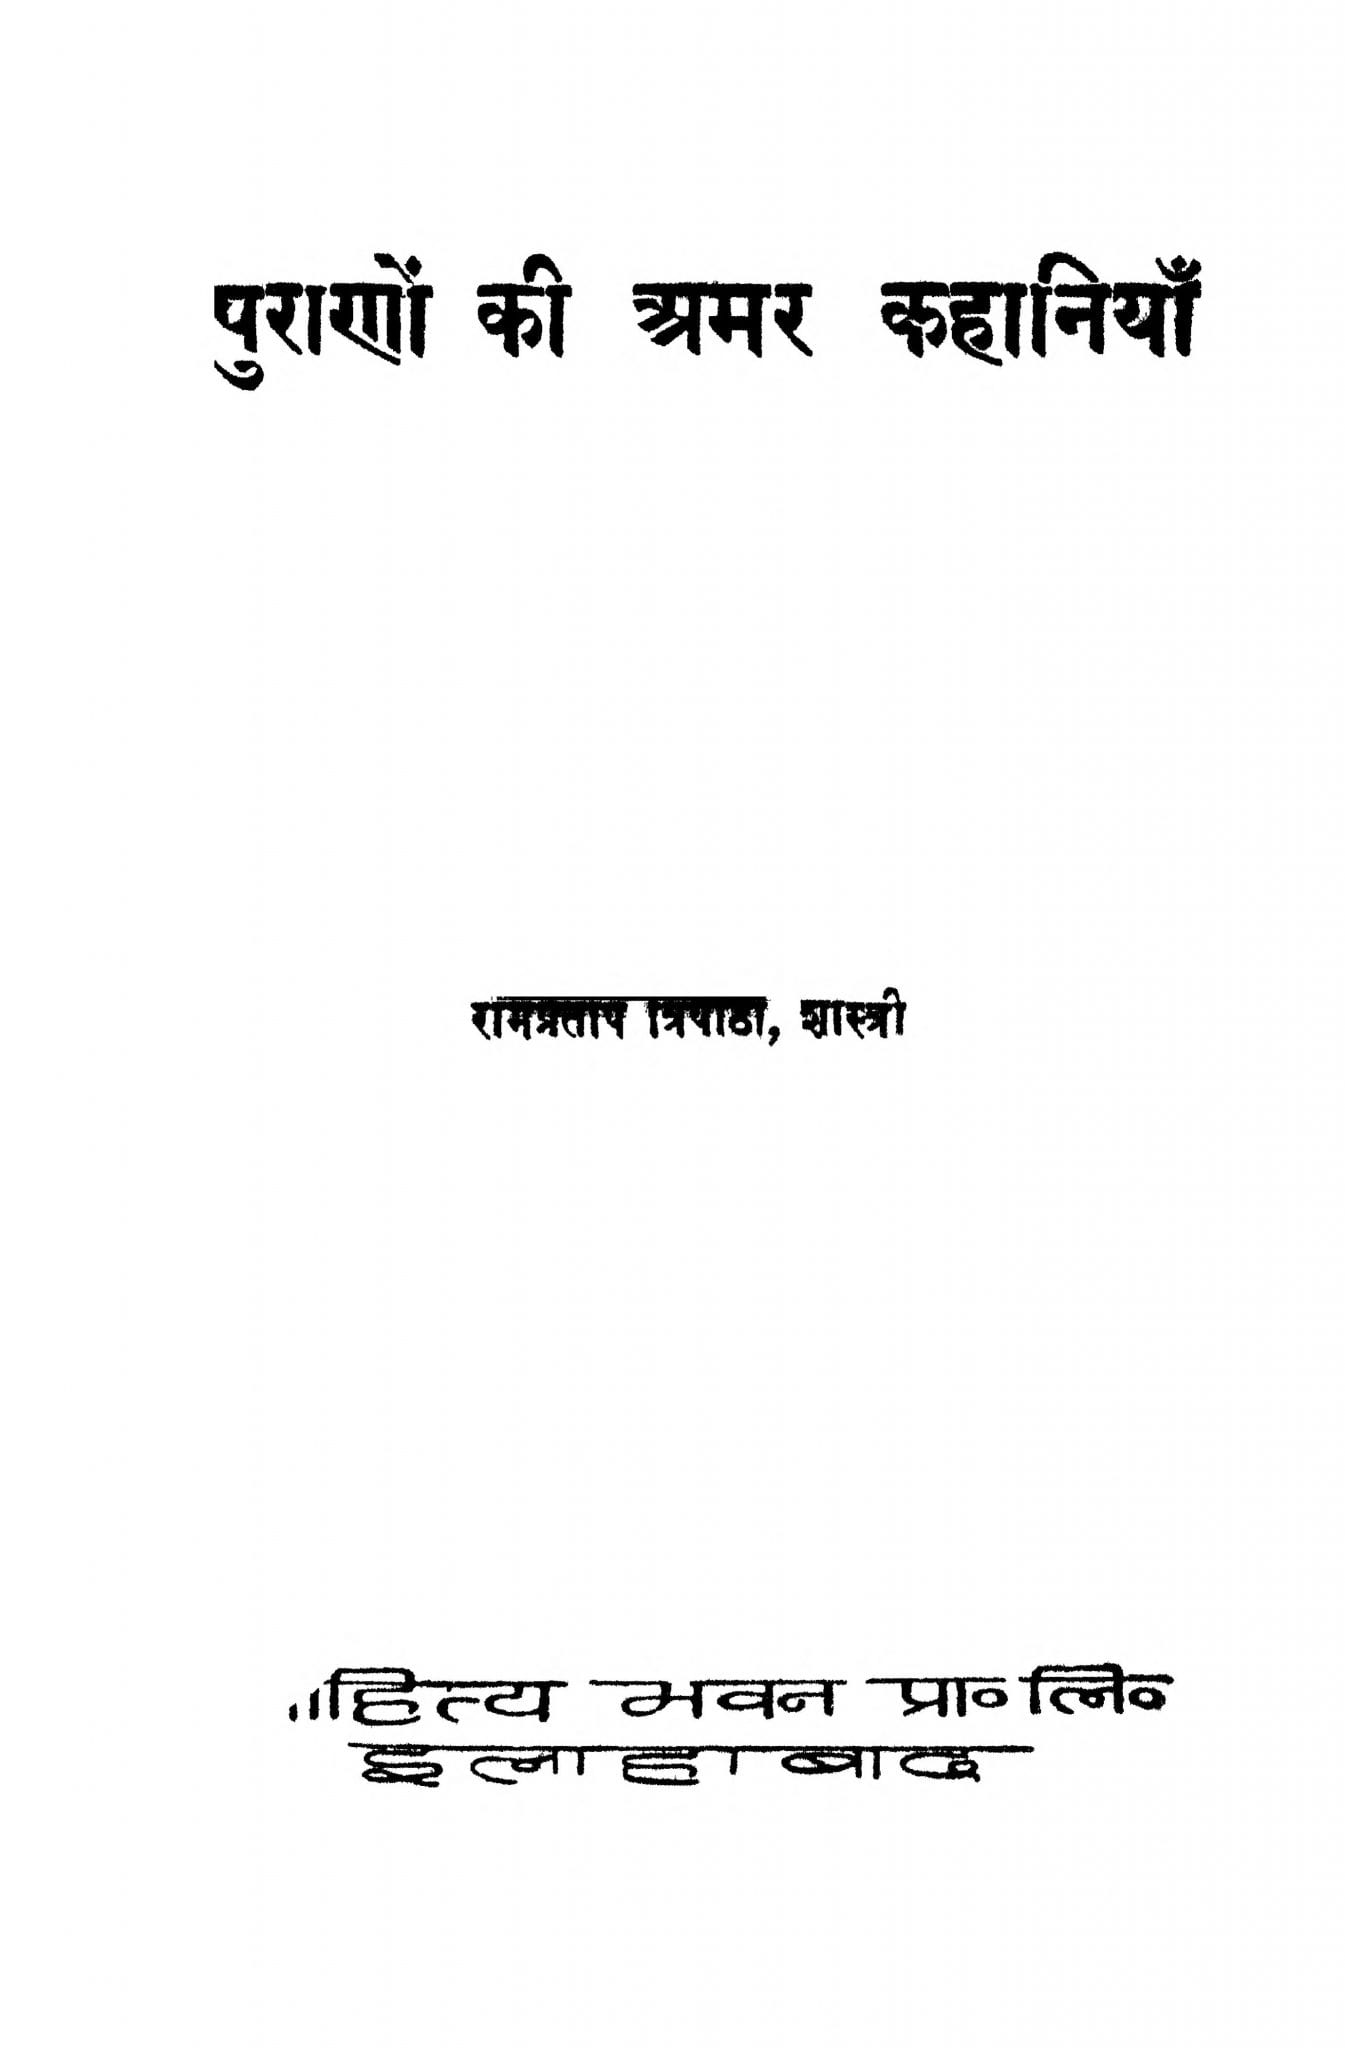 Book Image : पुराणों की अमर कहानियाँ - Puranon Ki Amar Kahaniyan